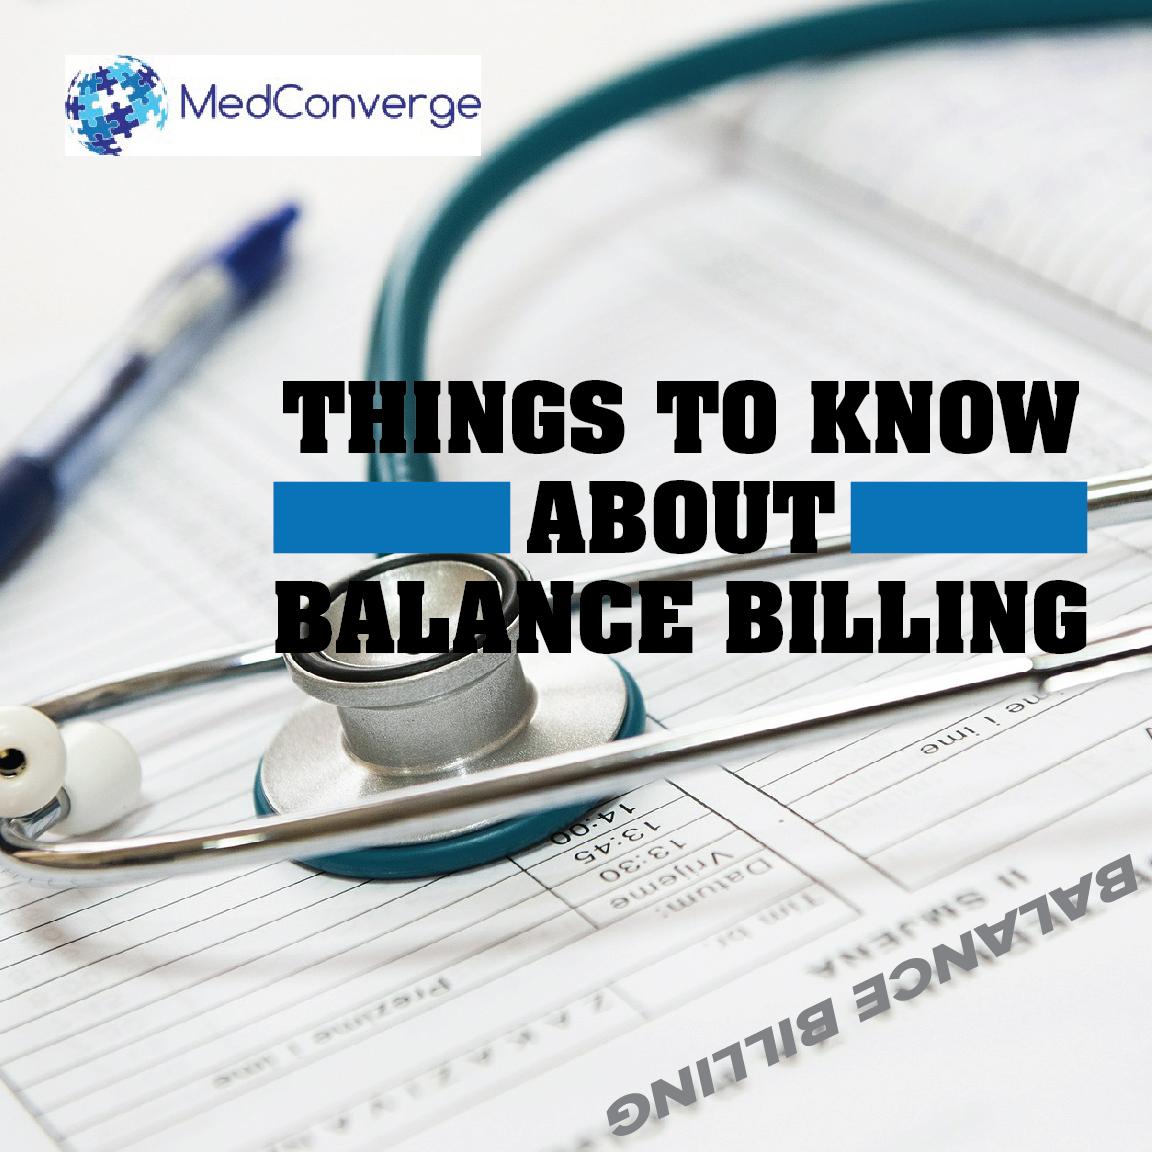 MedConverge Balance Billing